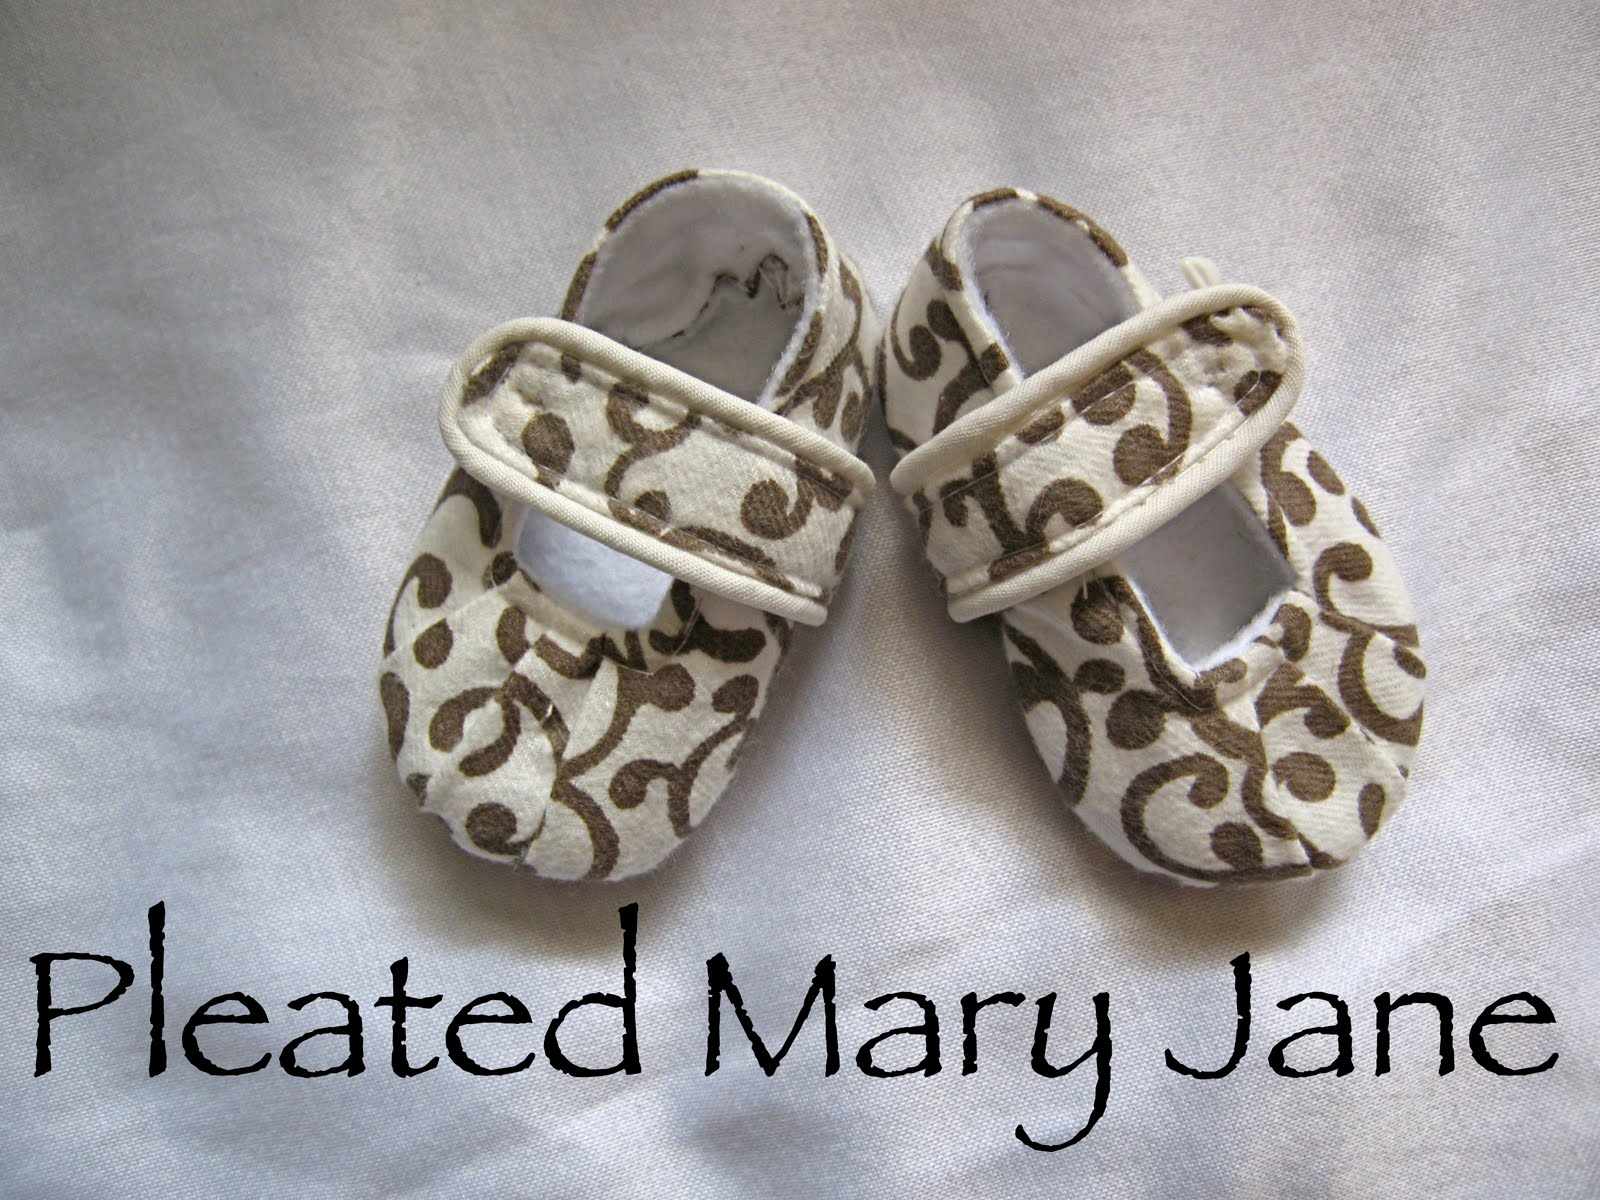 PIXNET oEmbed Profile  嬰兒鞋製作分享~~ @ 特別的夜晚 :: 痞客邦